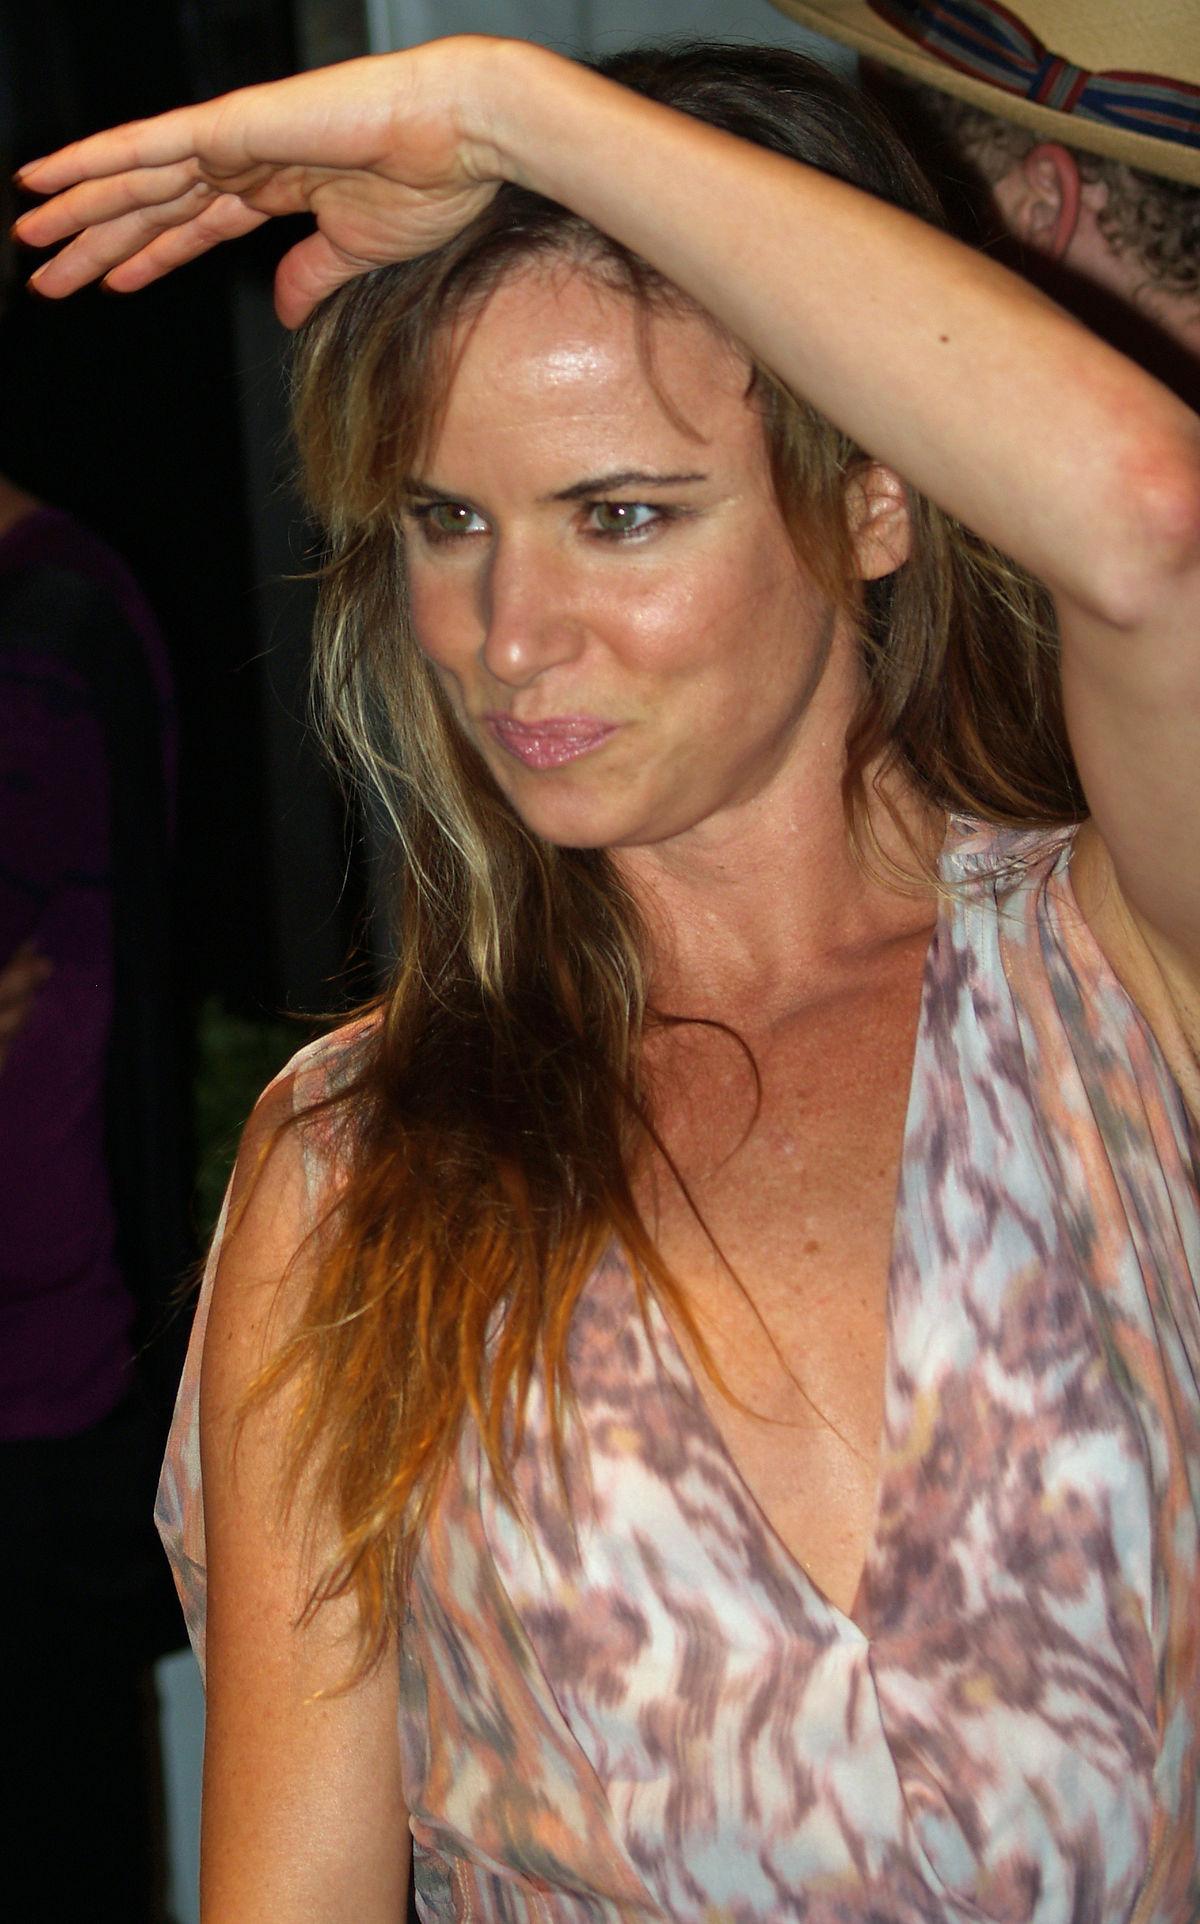 Glenis Duggan Batley - Who's Dated Who?